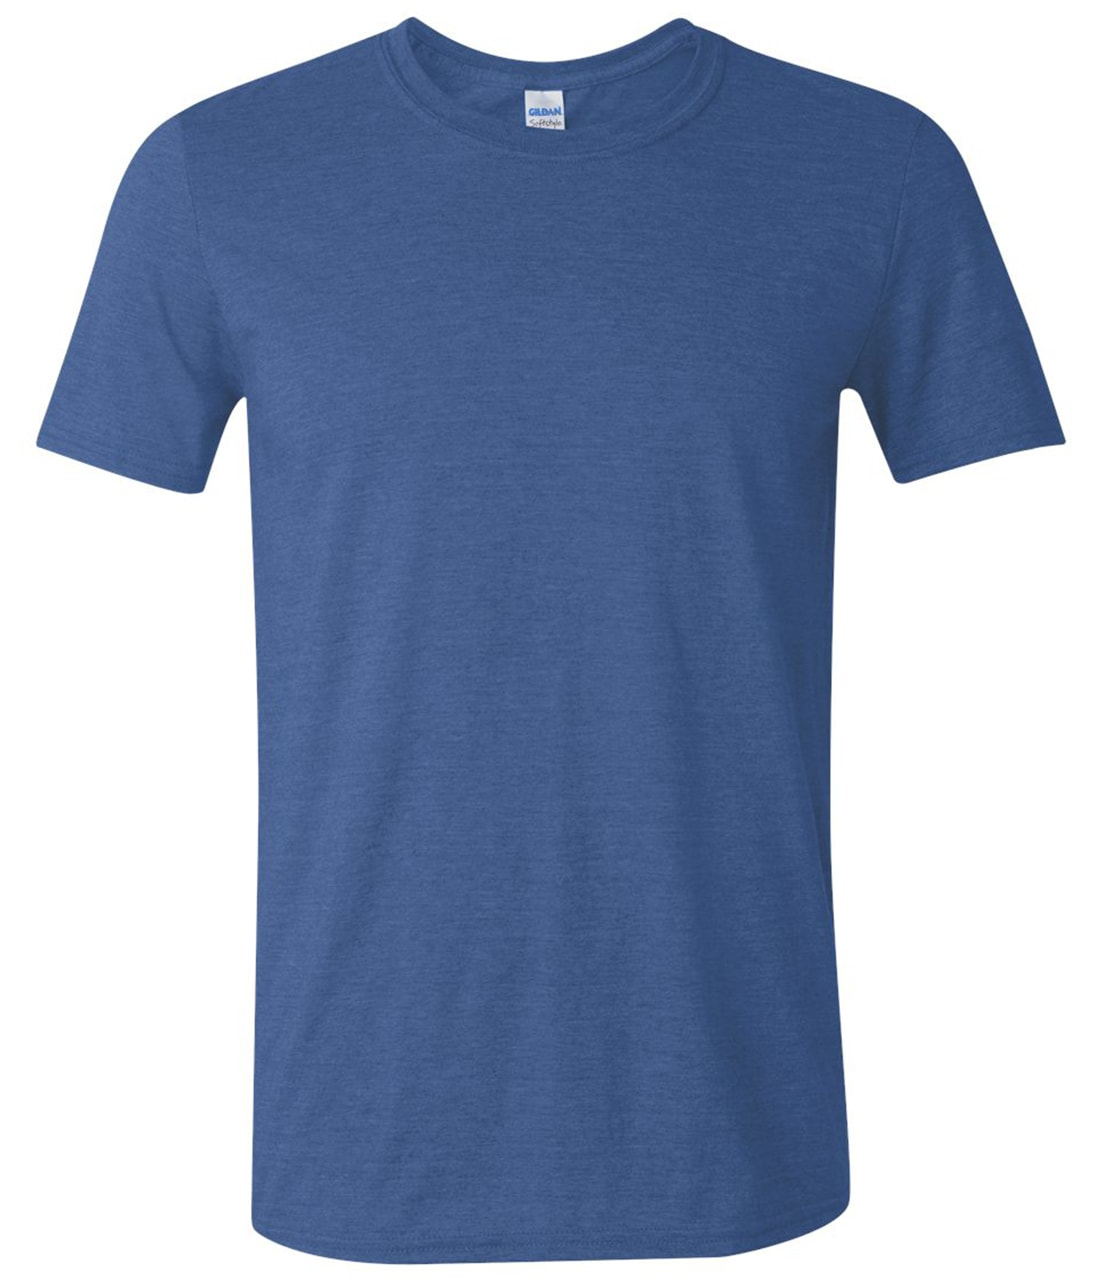 d12add12d8e44c GILDAN SoftStyle Ring Spun T-Shirt   Custom T Shirts   Entripy